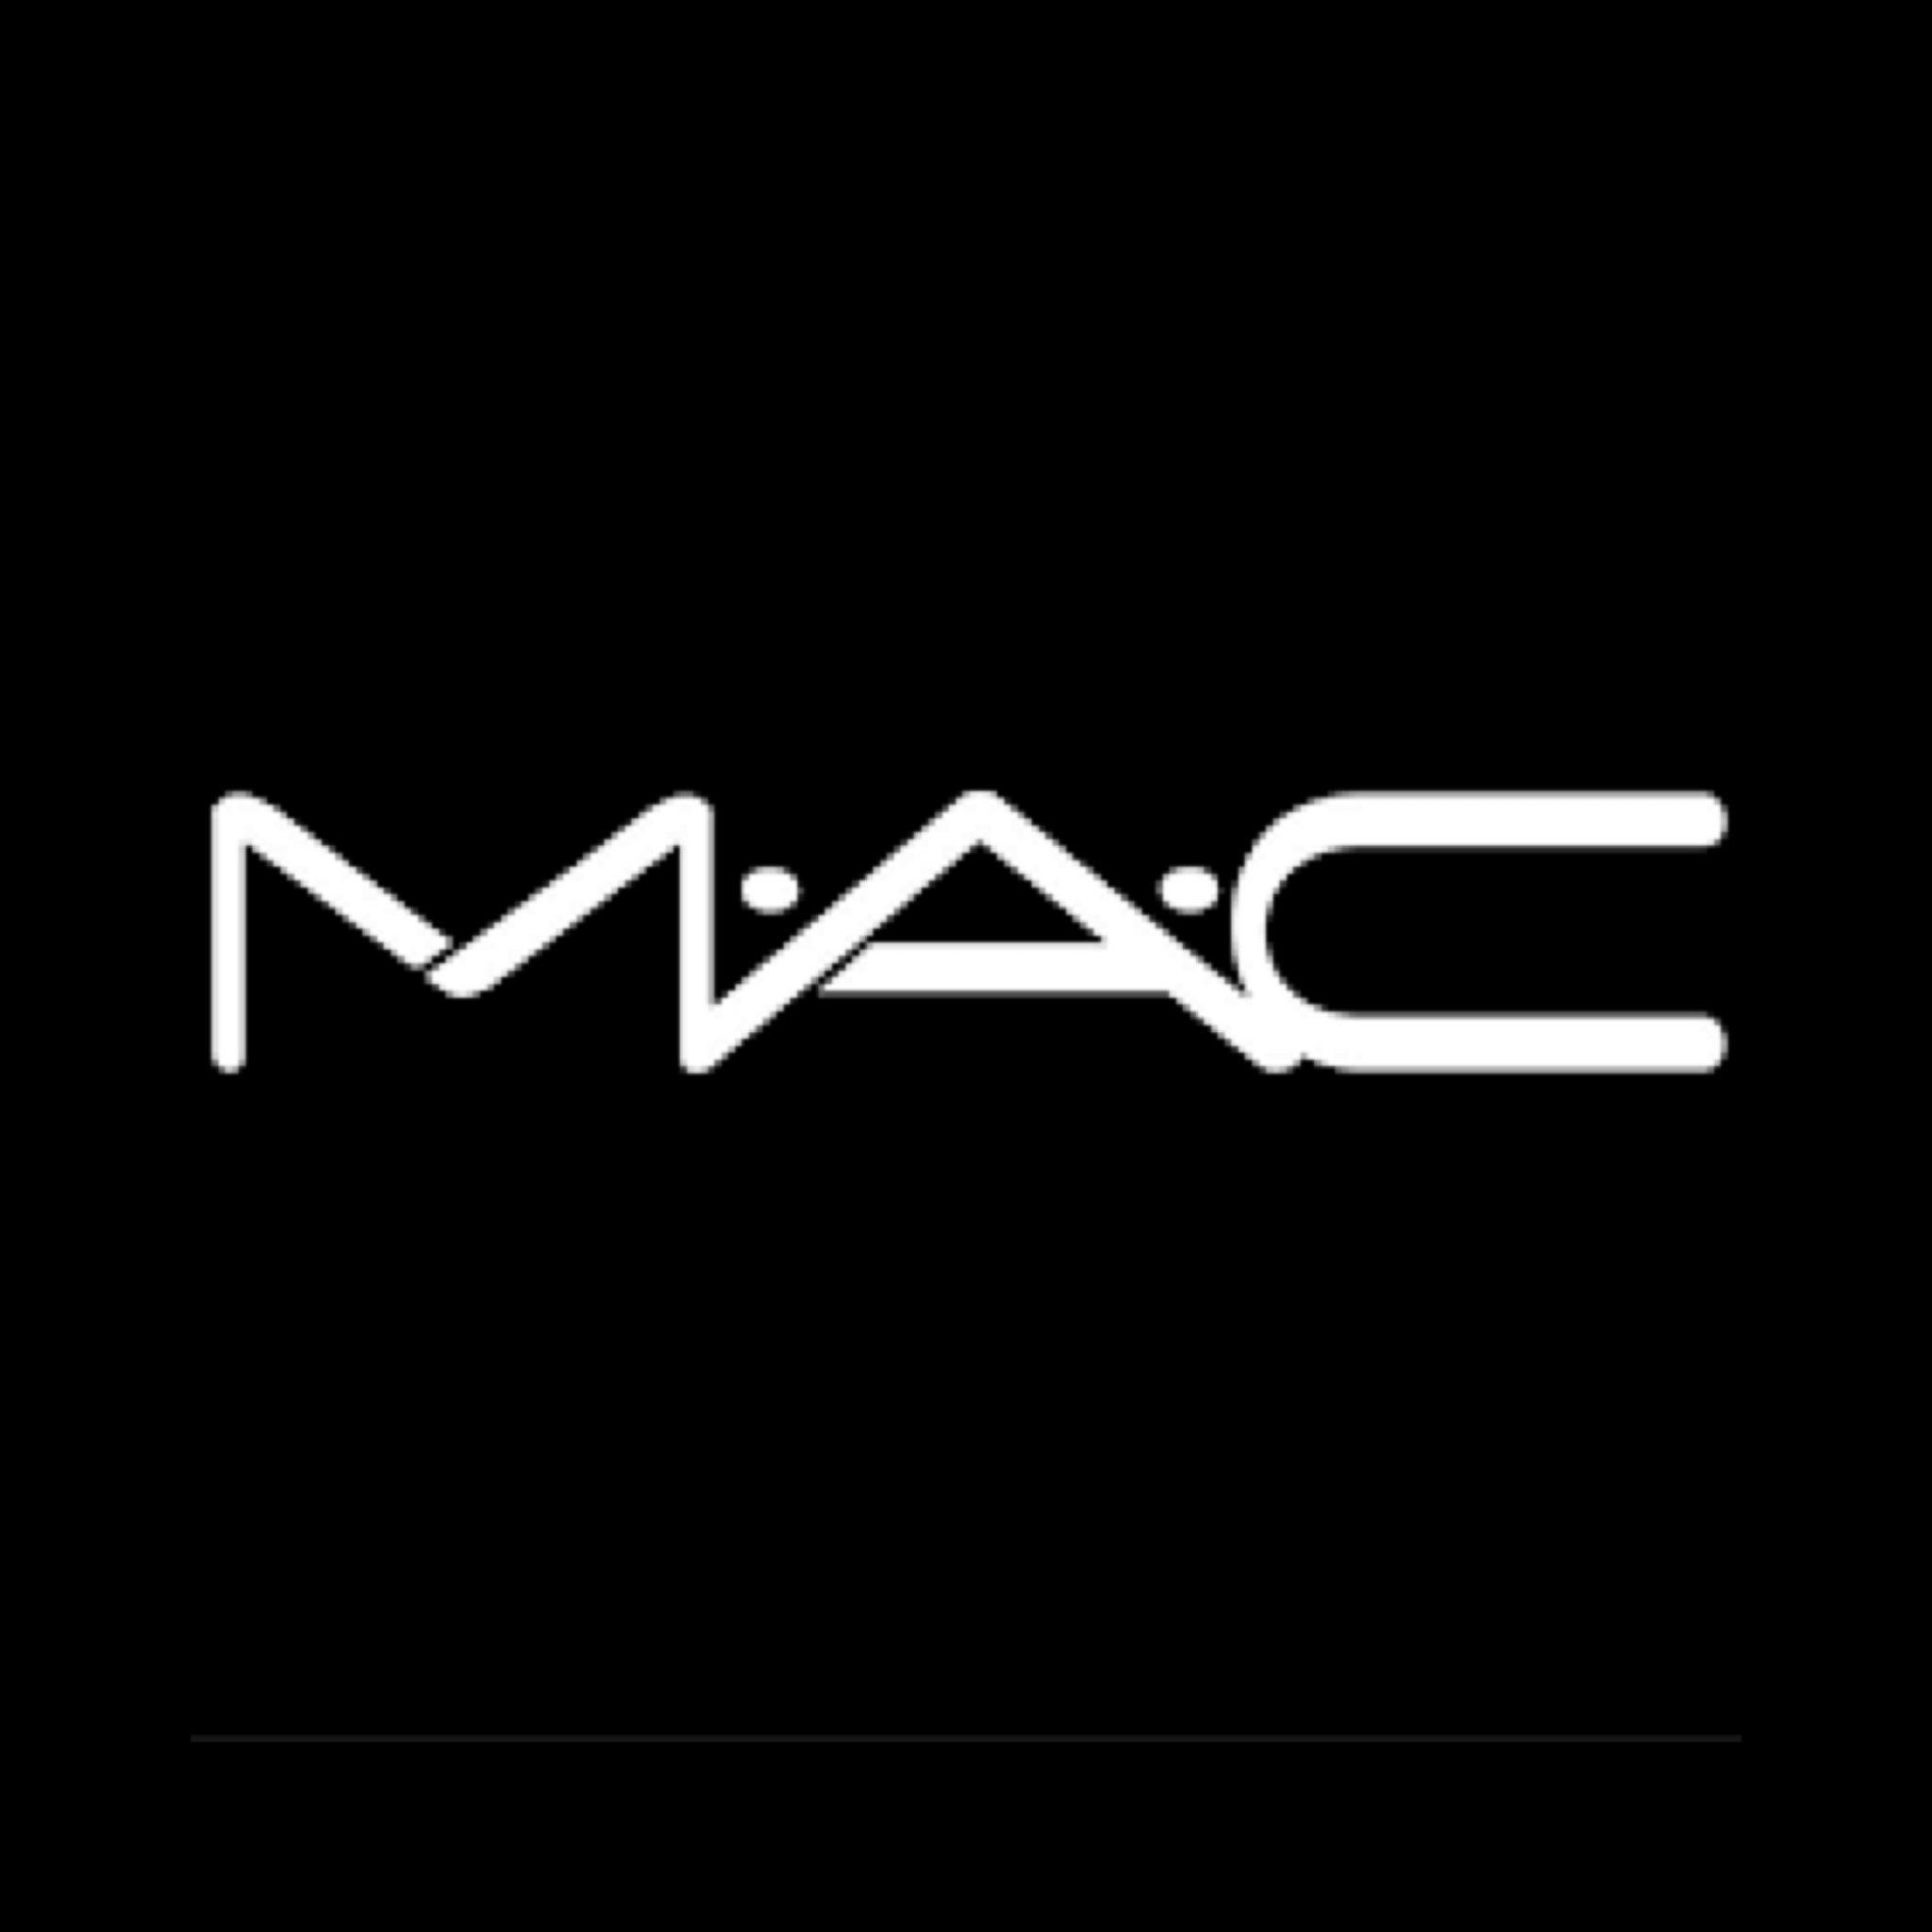 mac-2048x2048